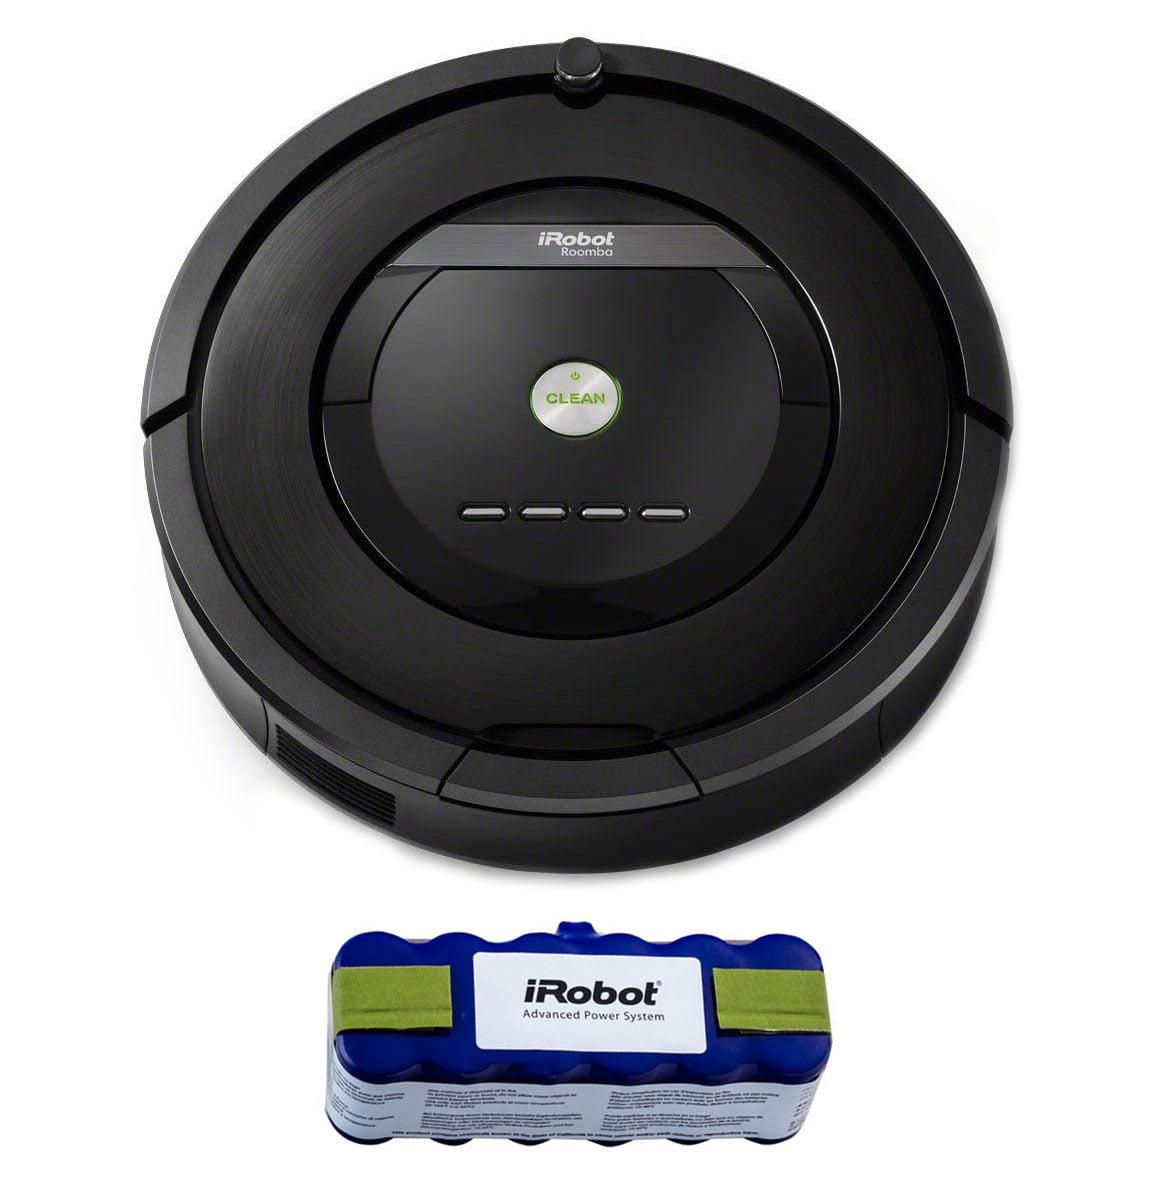 iRobot Roomba 880 Robotic Vacuum Cleaner w/ XLife Extende...